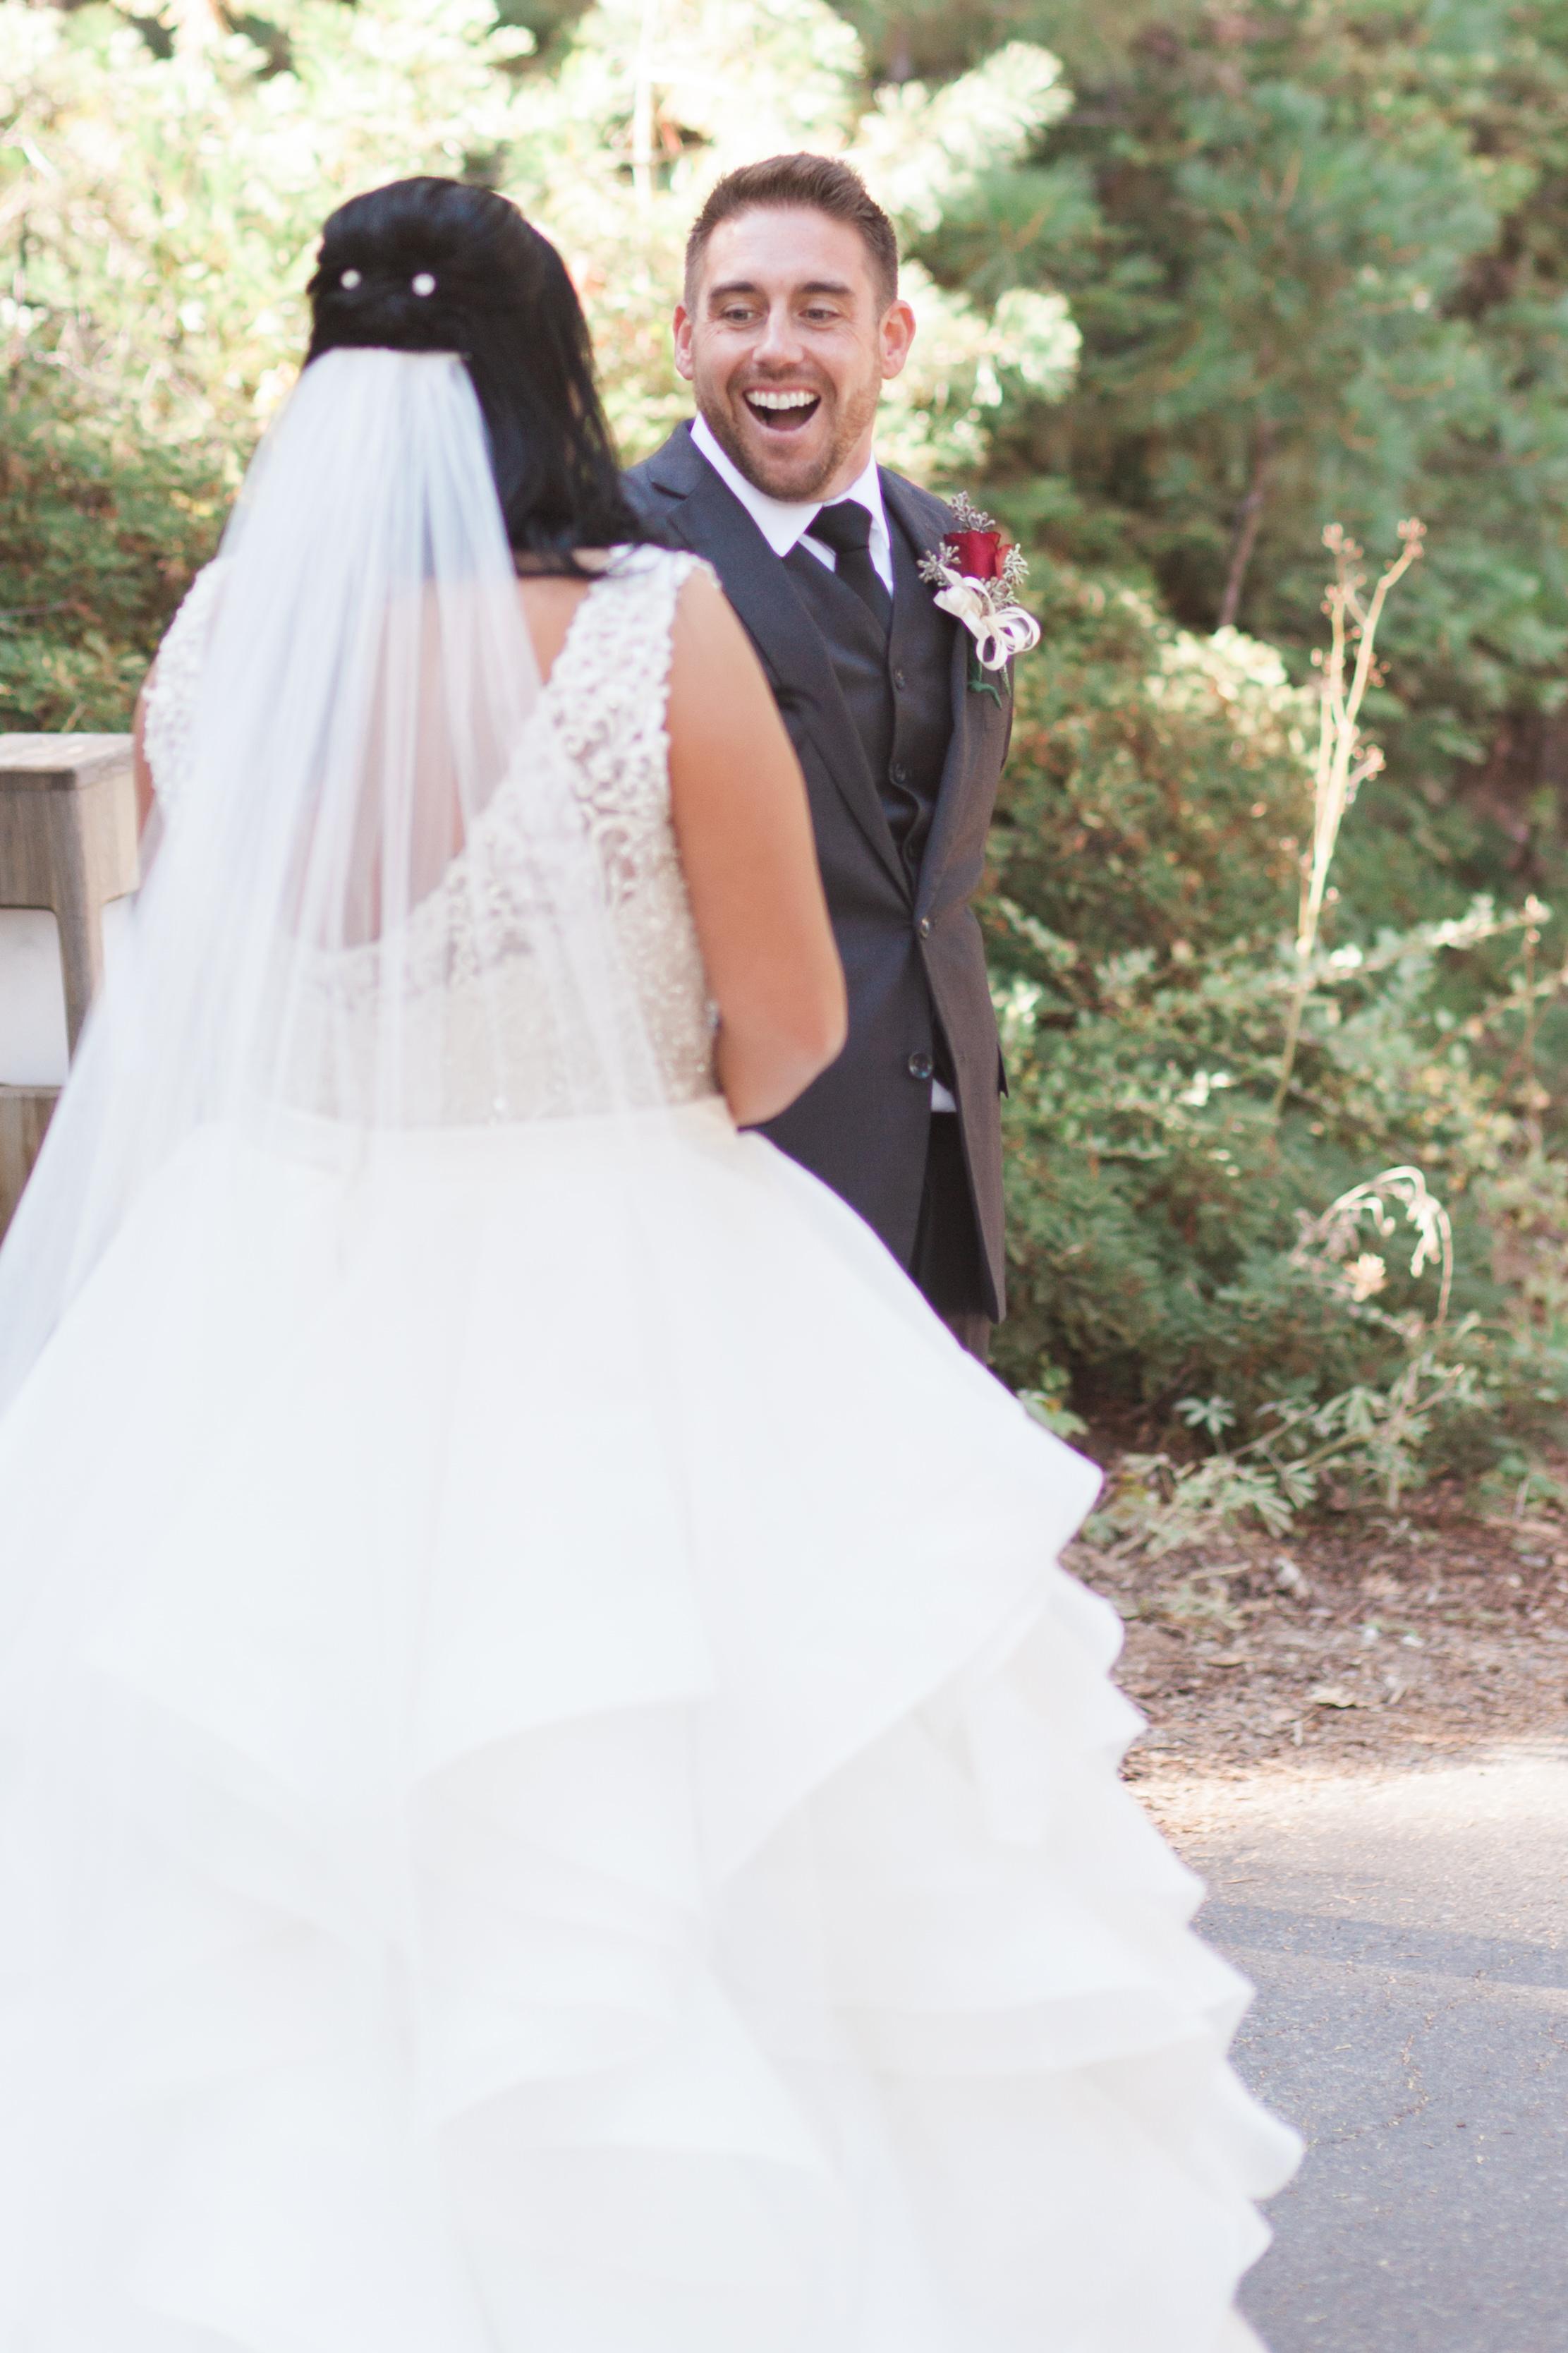 Yosemite-wedding-at-Tenaya-lodge-8.jpg